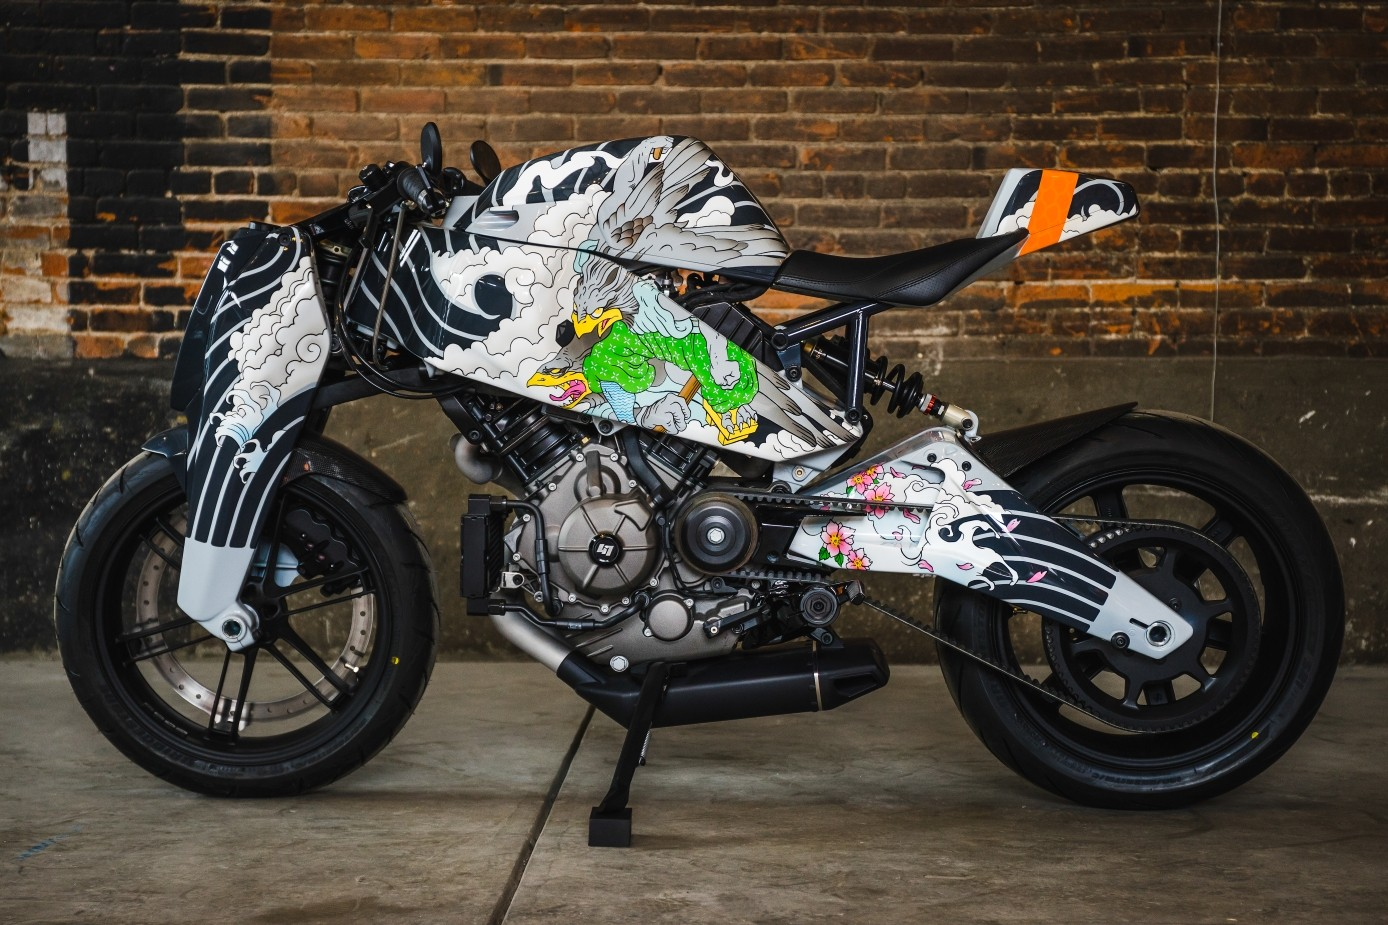 ebr motorcycles announces new 2017 models